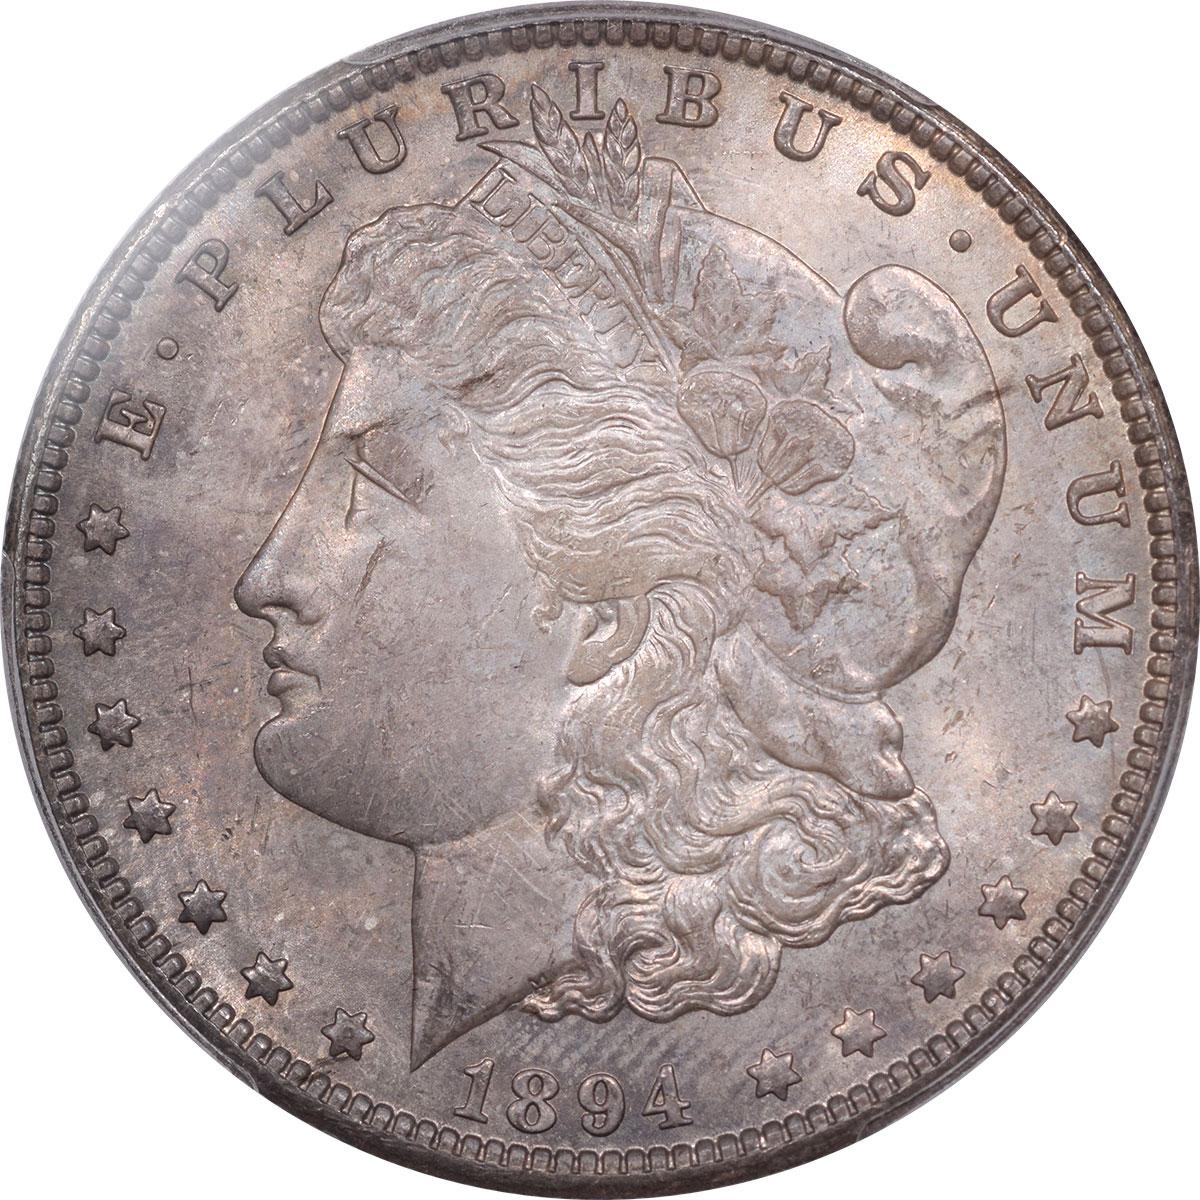 Morgan Dollars 1894-O MORGAN DOLLAR PCGS MS-64, ORIGINAL AND WHOLESOME